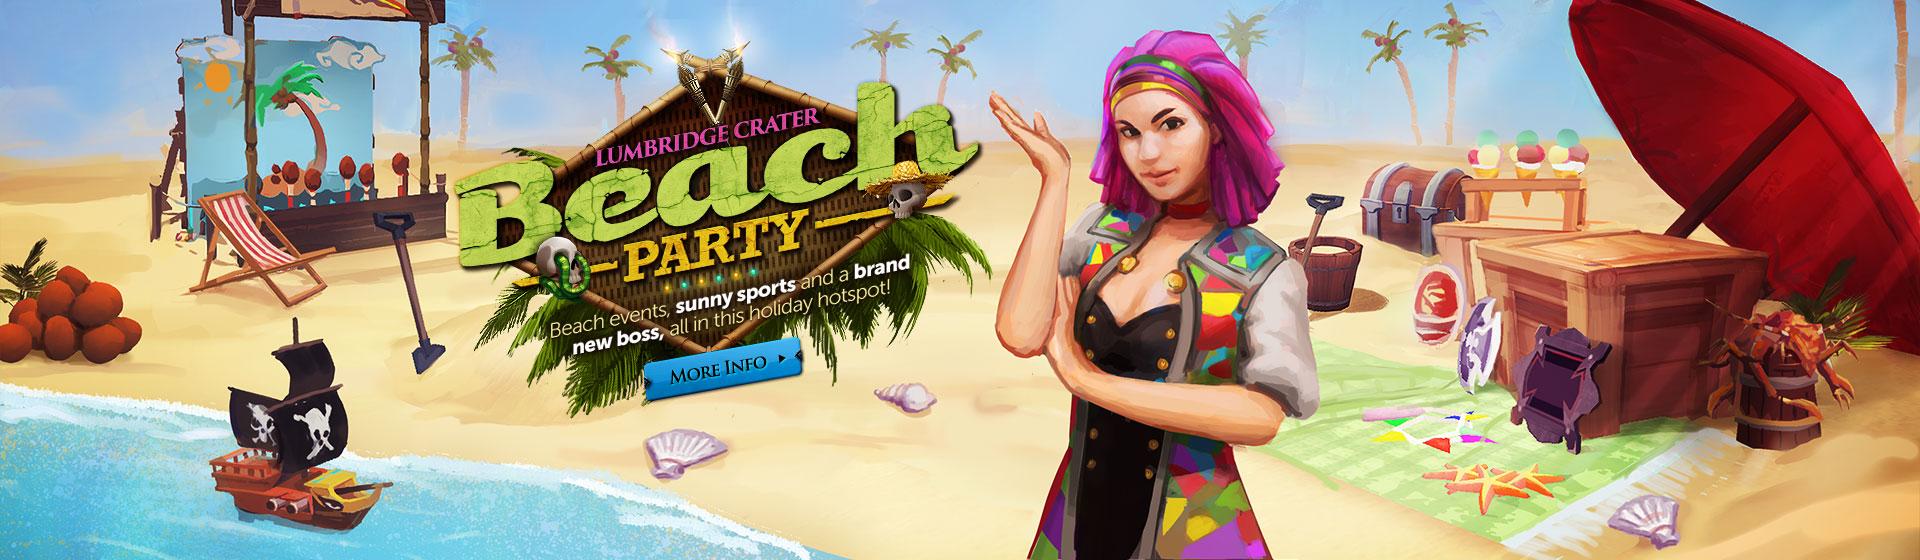 Image - Summer Beach Party head banner.jpg | RuneScape Wiki ...